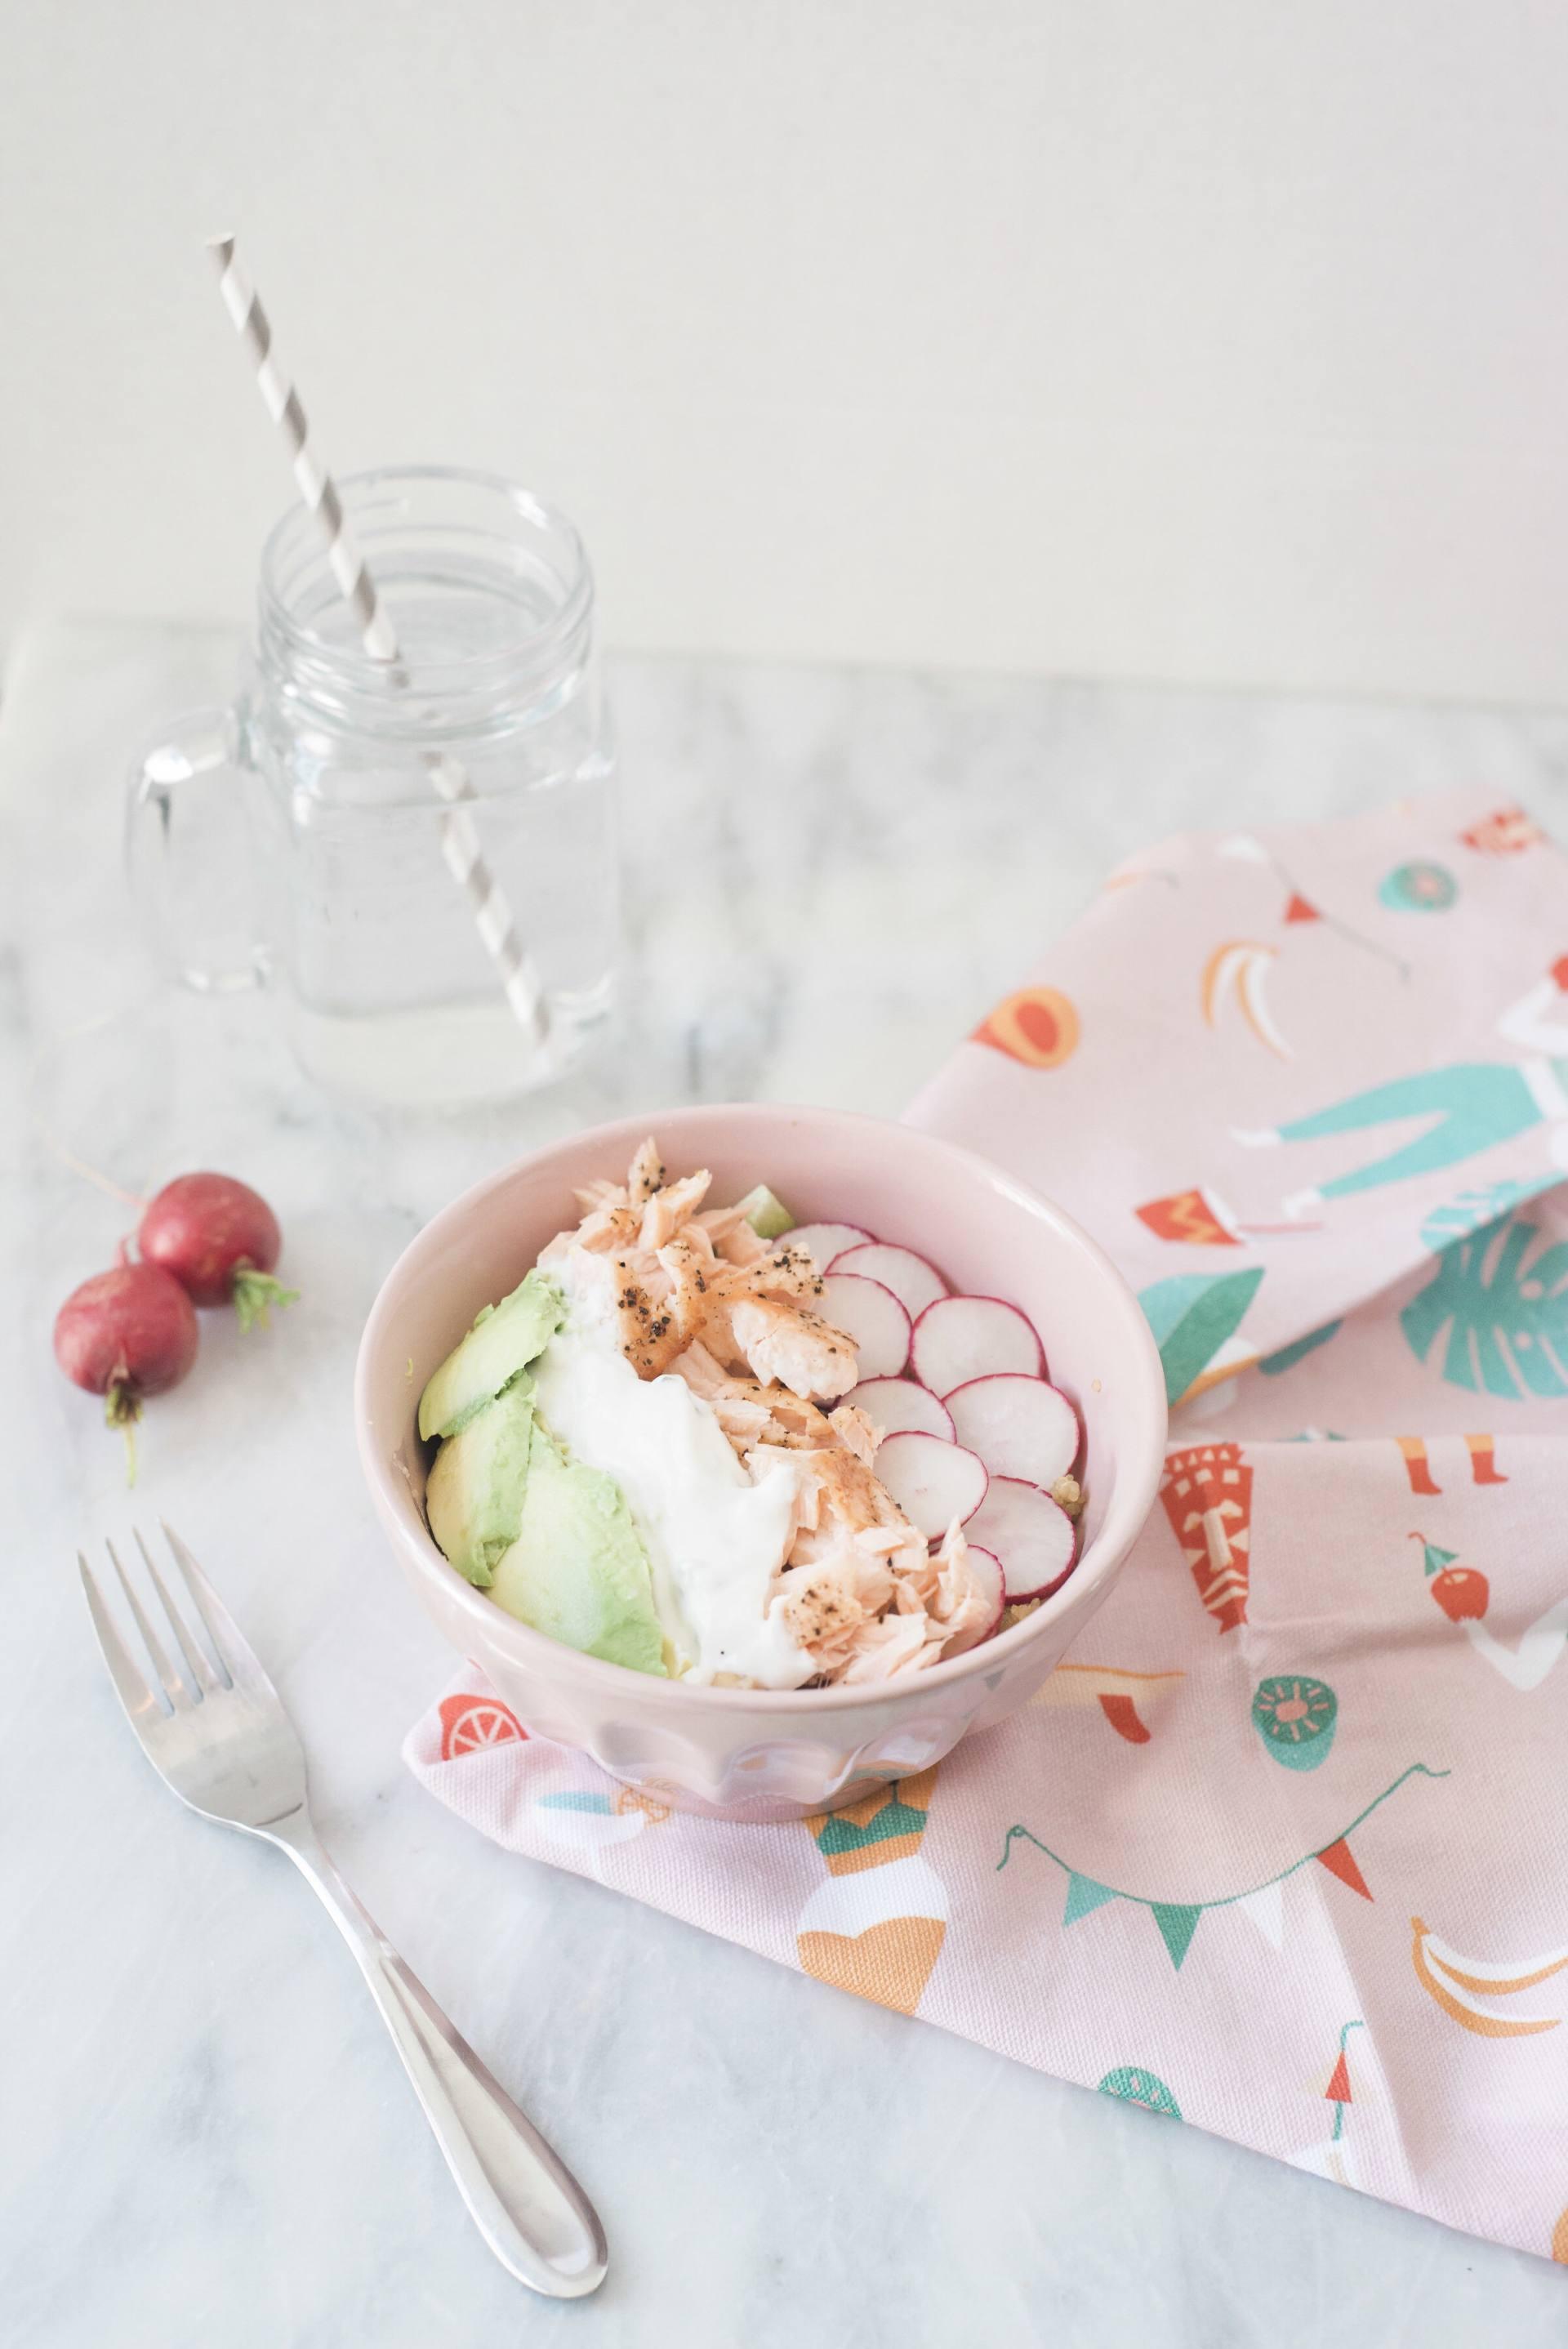 The Tastiest Summer Salmon Bowl Recipe